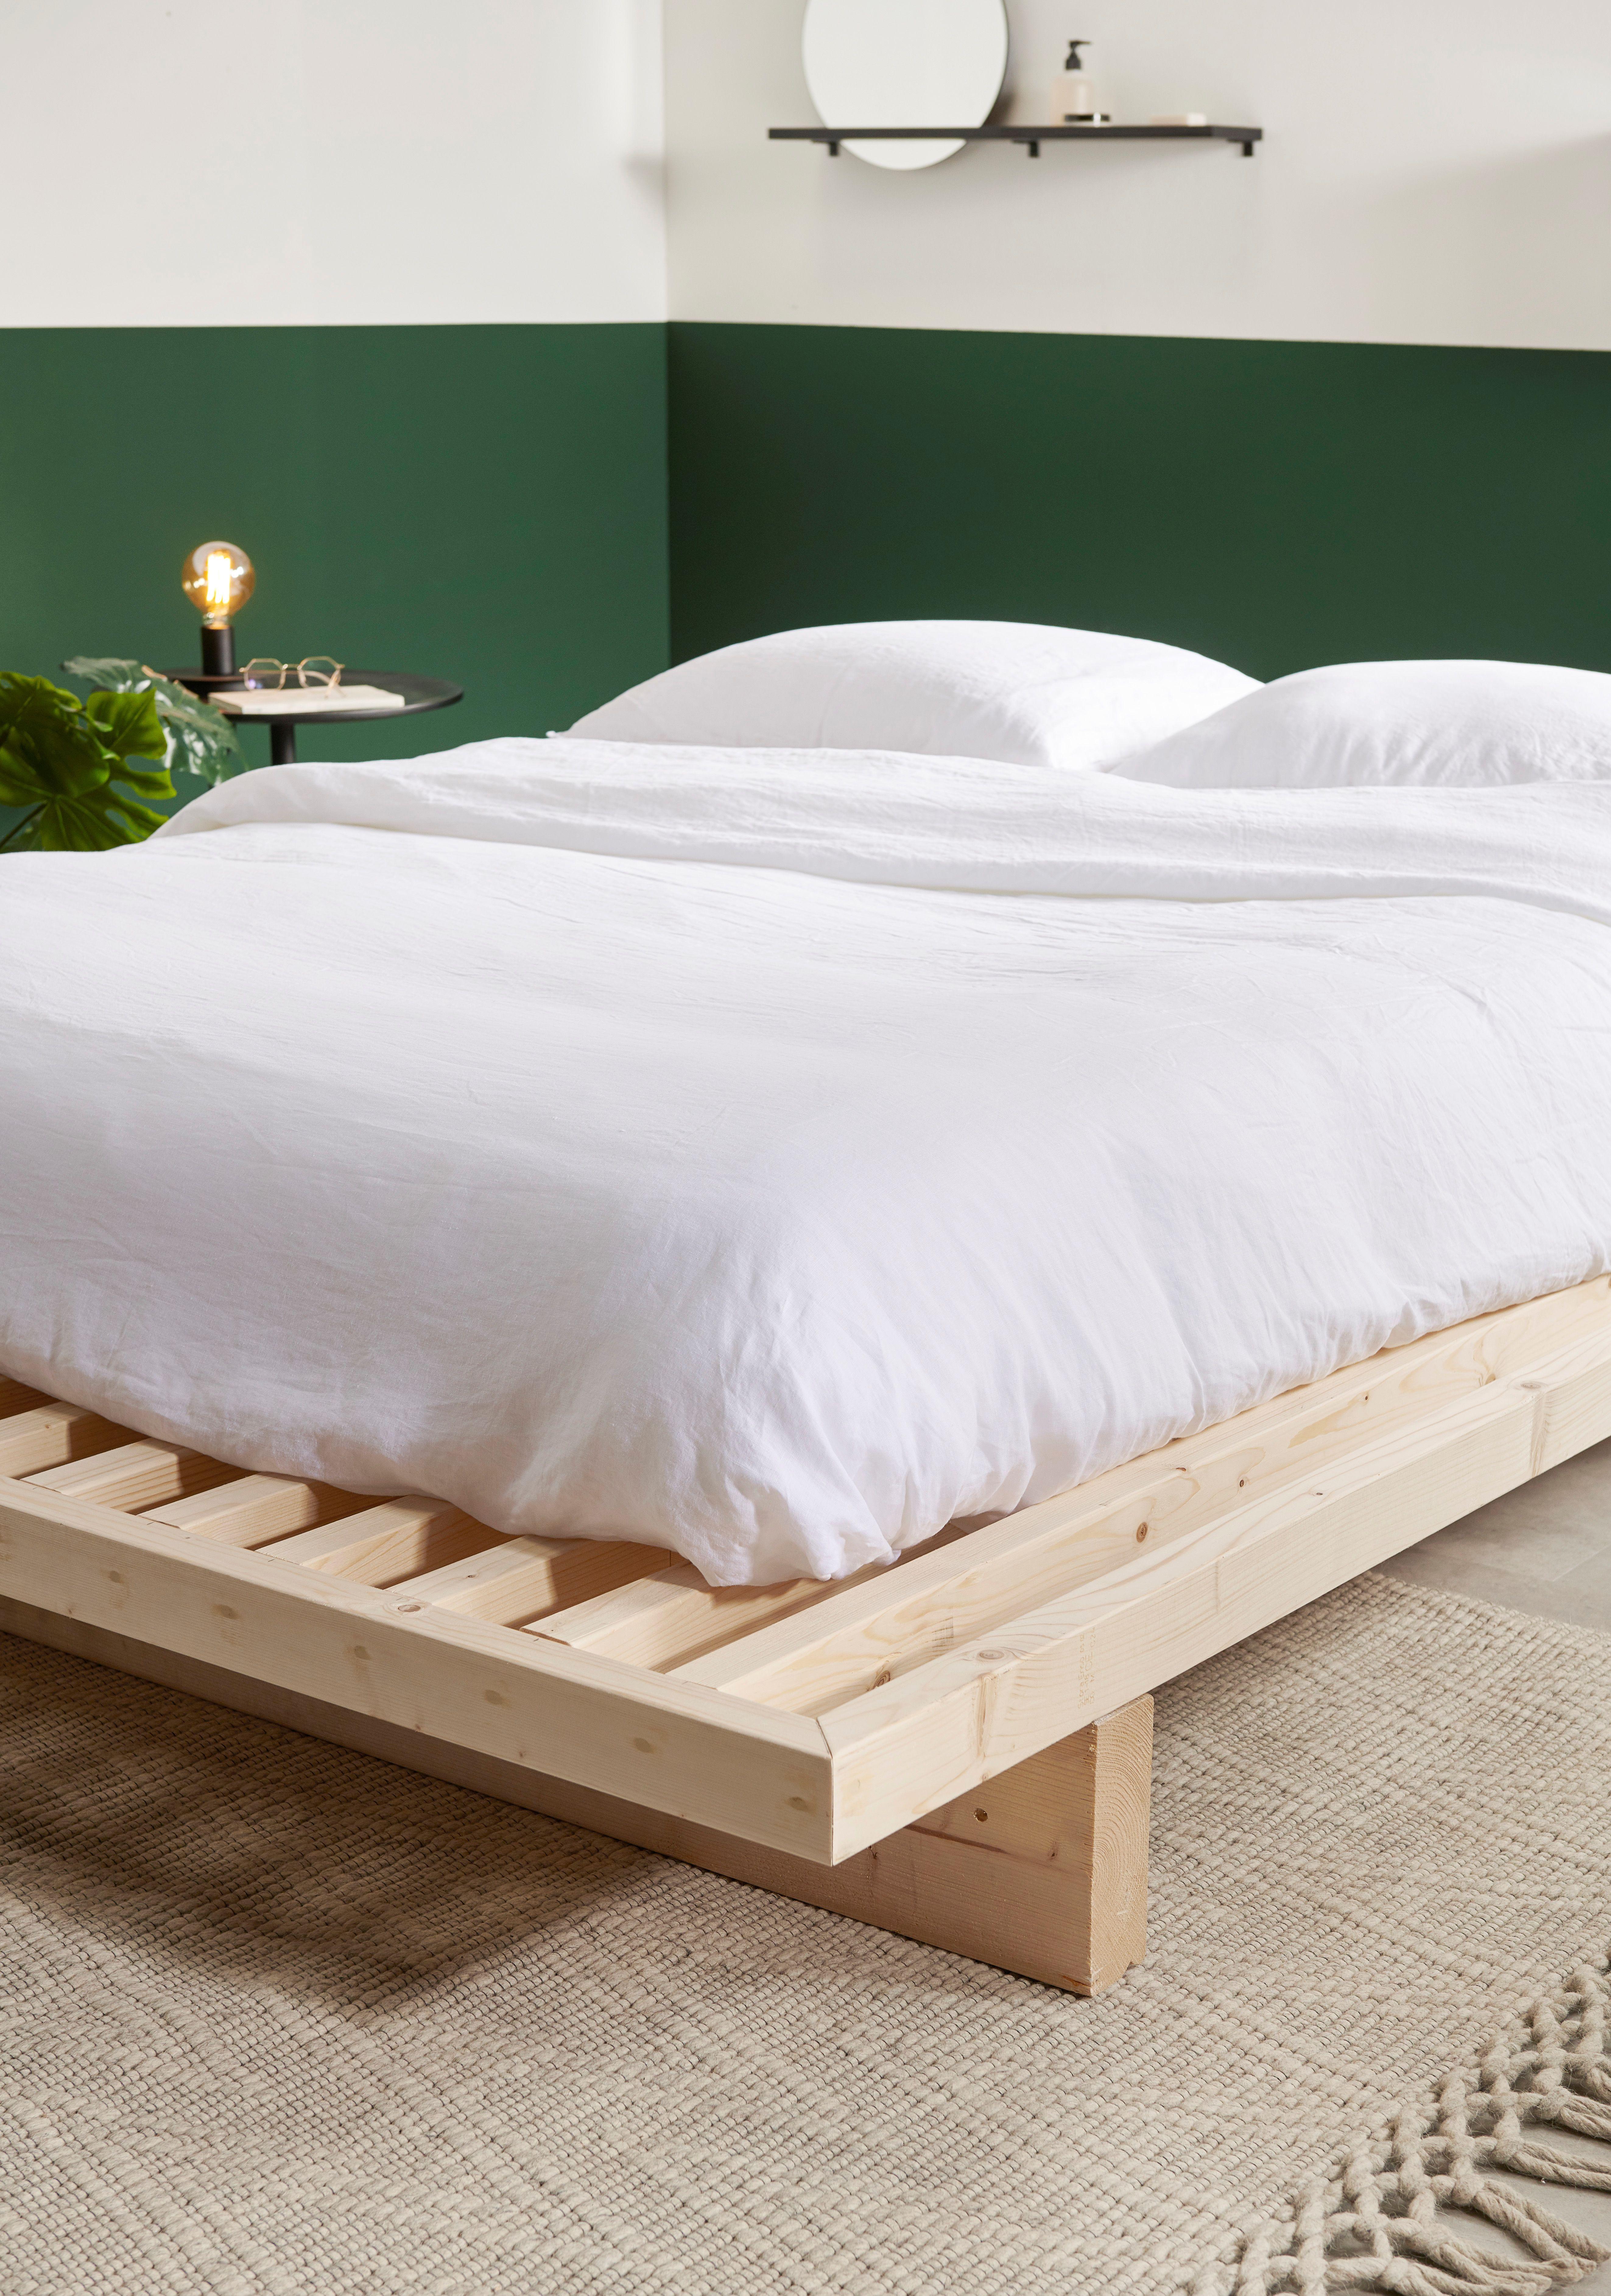 KARWEI in 2020 Minimalist bed, Zen bed, Bed frame design